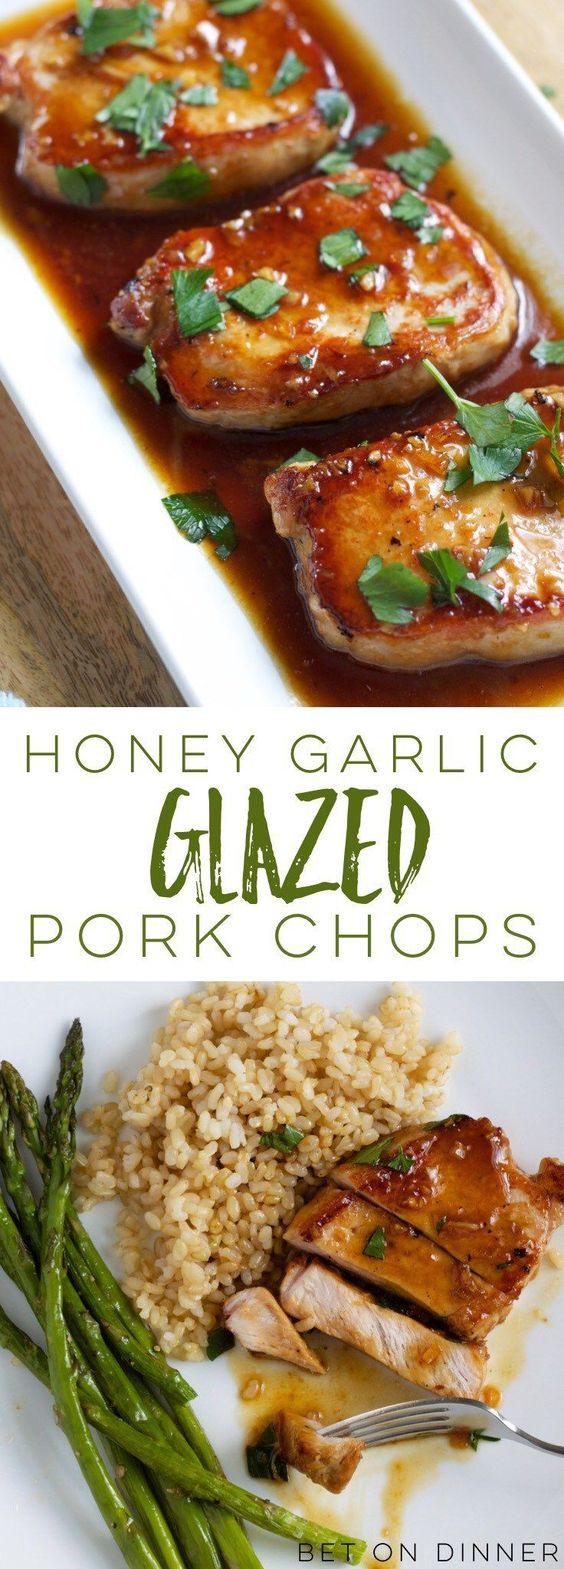 Recipe – Honey Garlic Pork Chops #recipe #honey #garlic #pork #chops #dinnerrecipes #dinnerideas #dinner